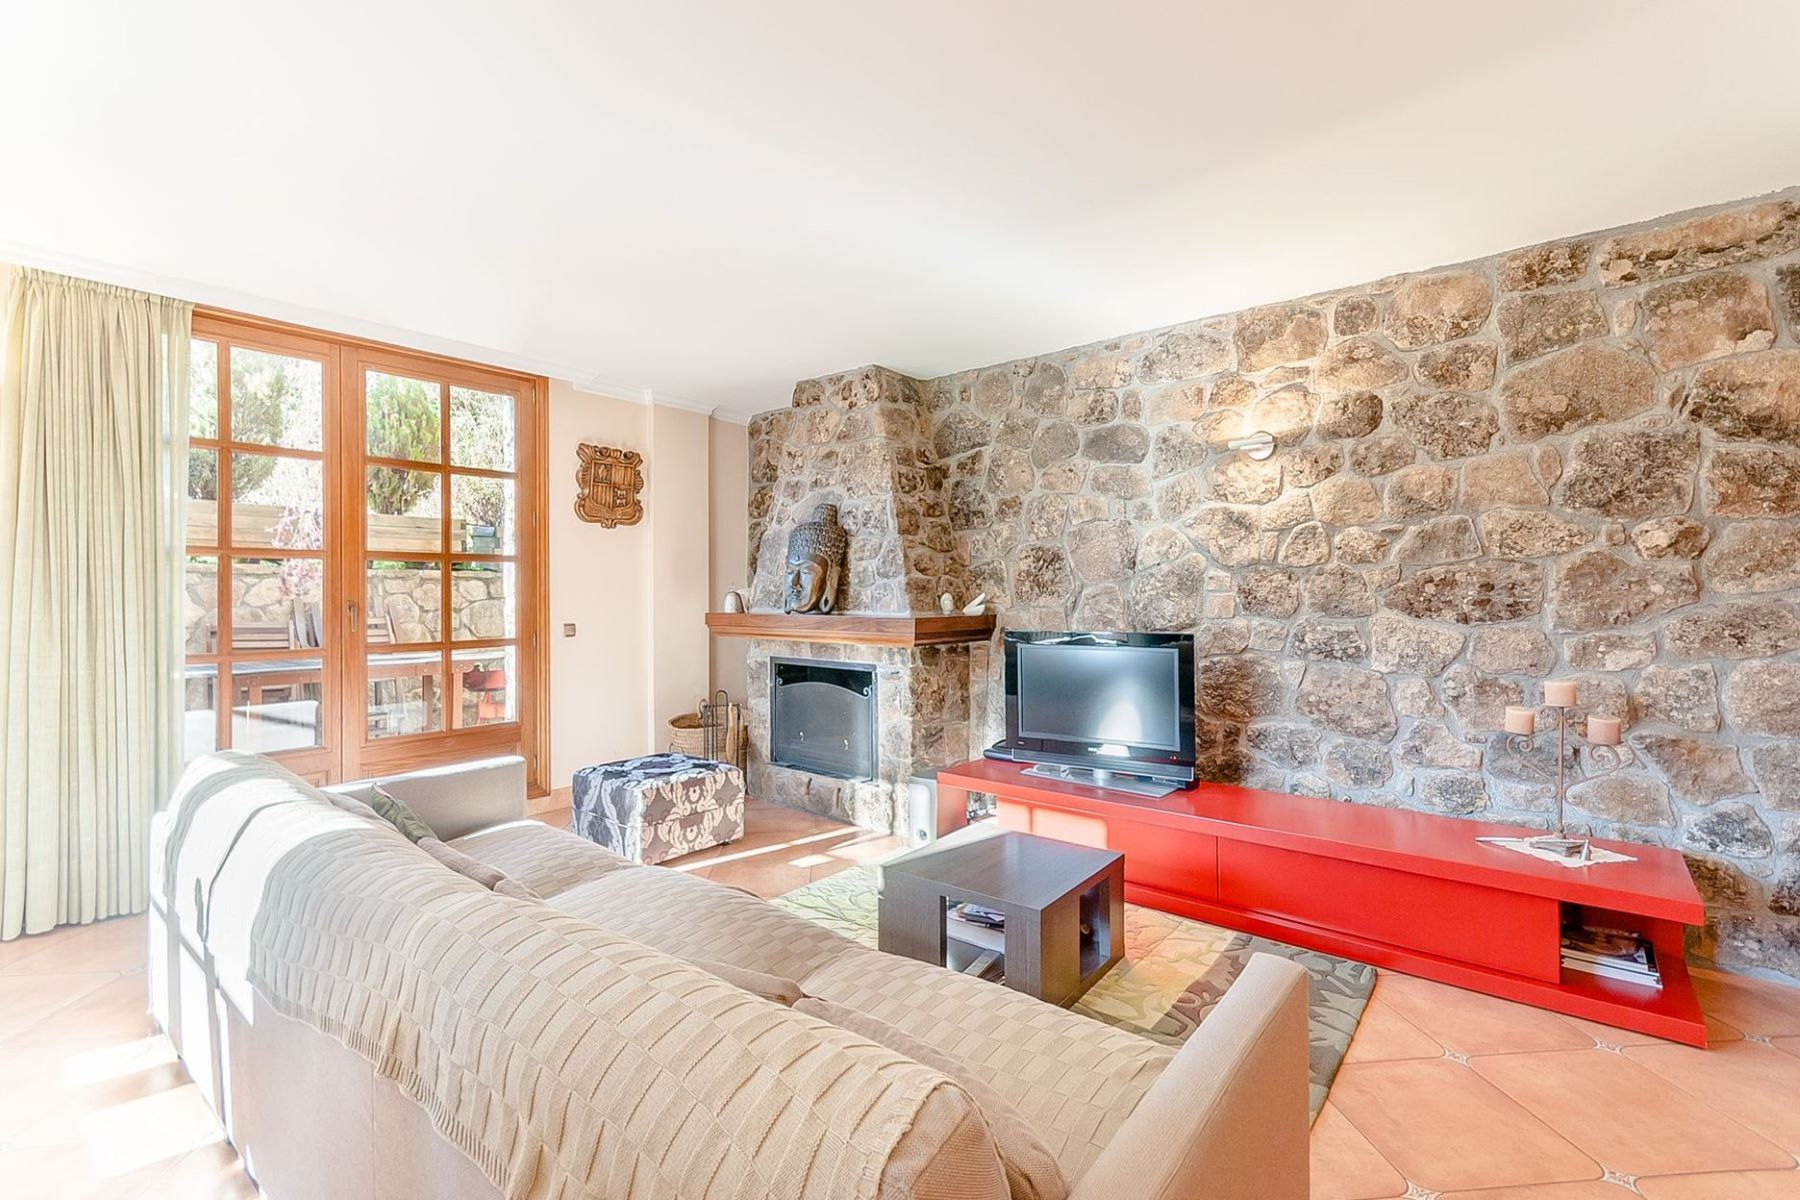 Apartment for Sale at Ground floor for sale in Sispony Sispony, La Massana, AD400 Andorra